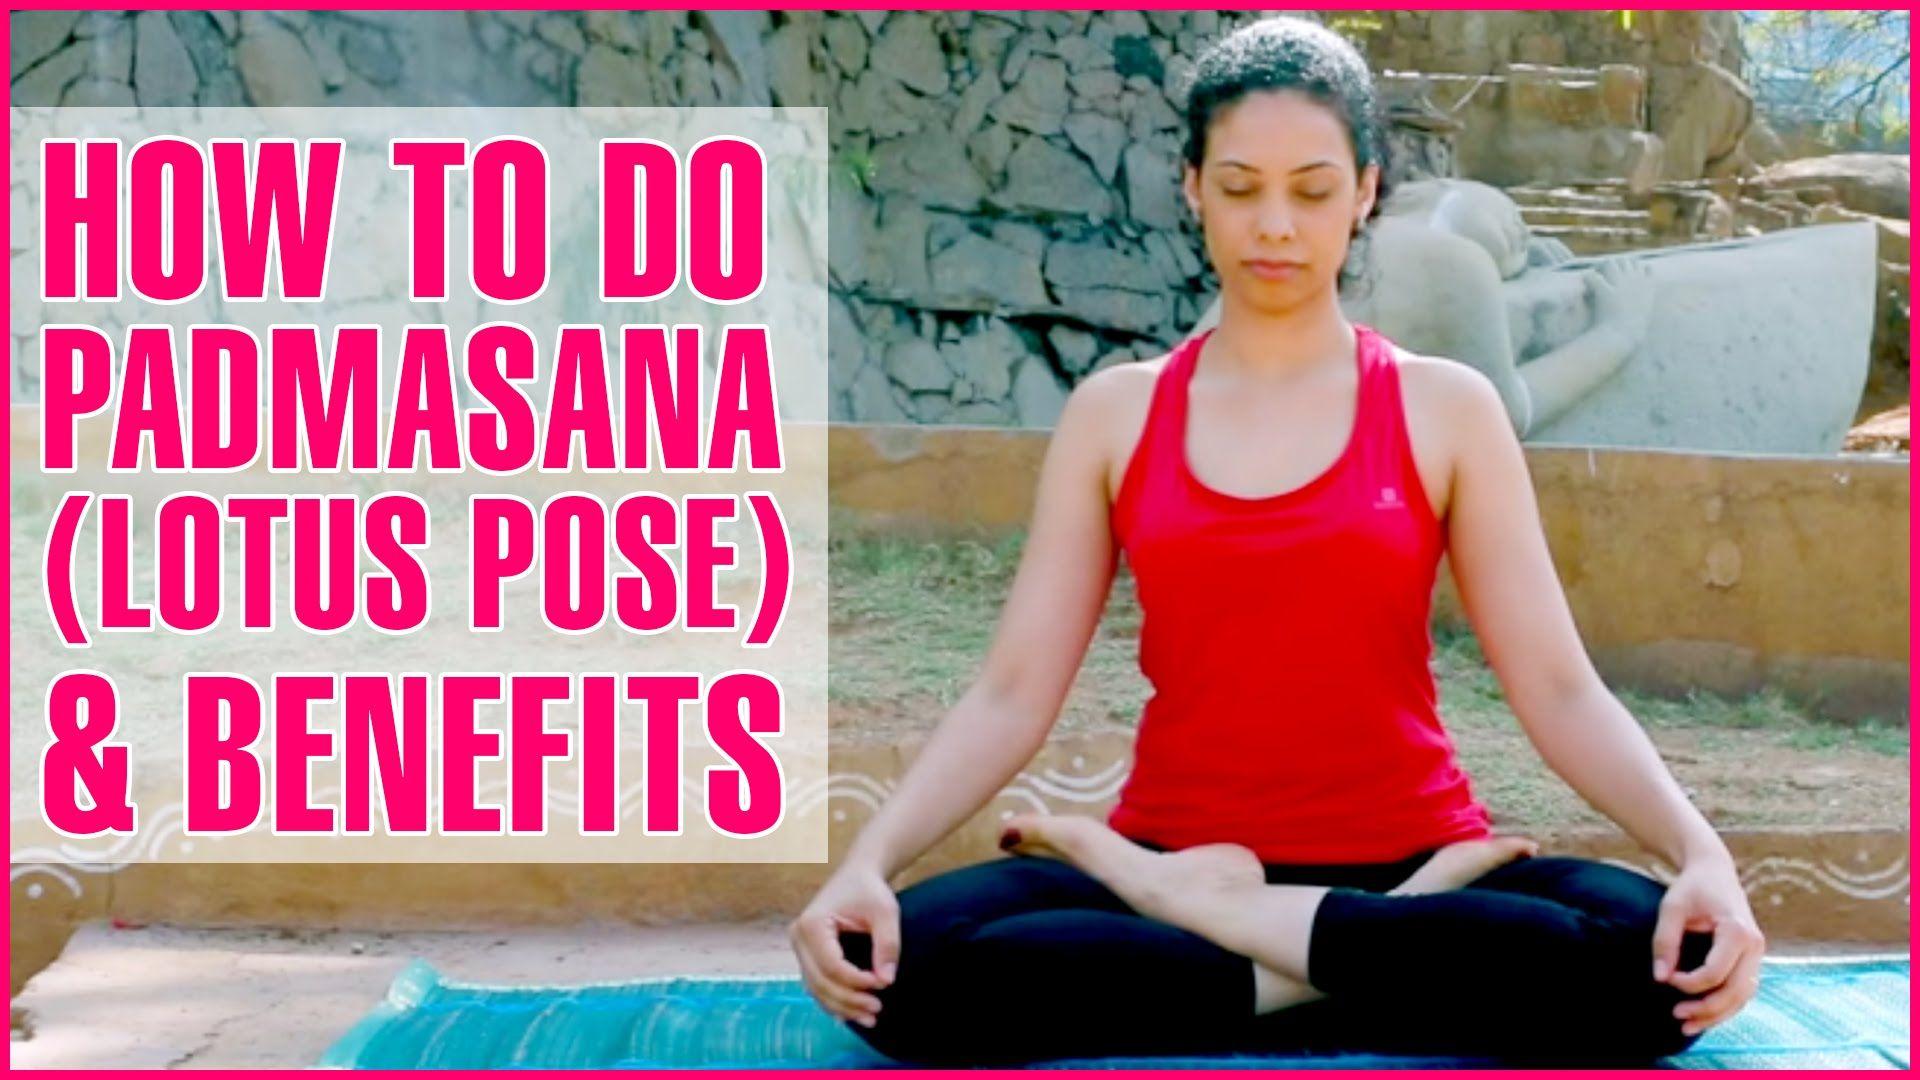 Padmasana - Lotus Yoga Posture - The Holistic Care